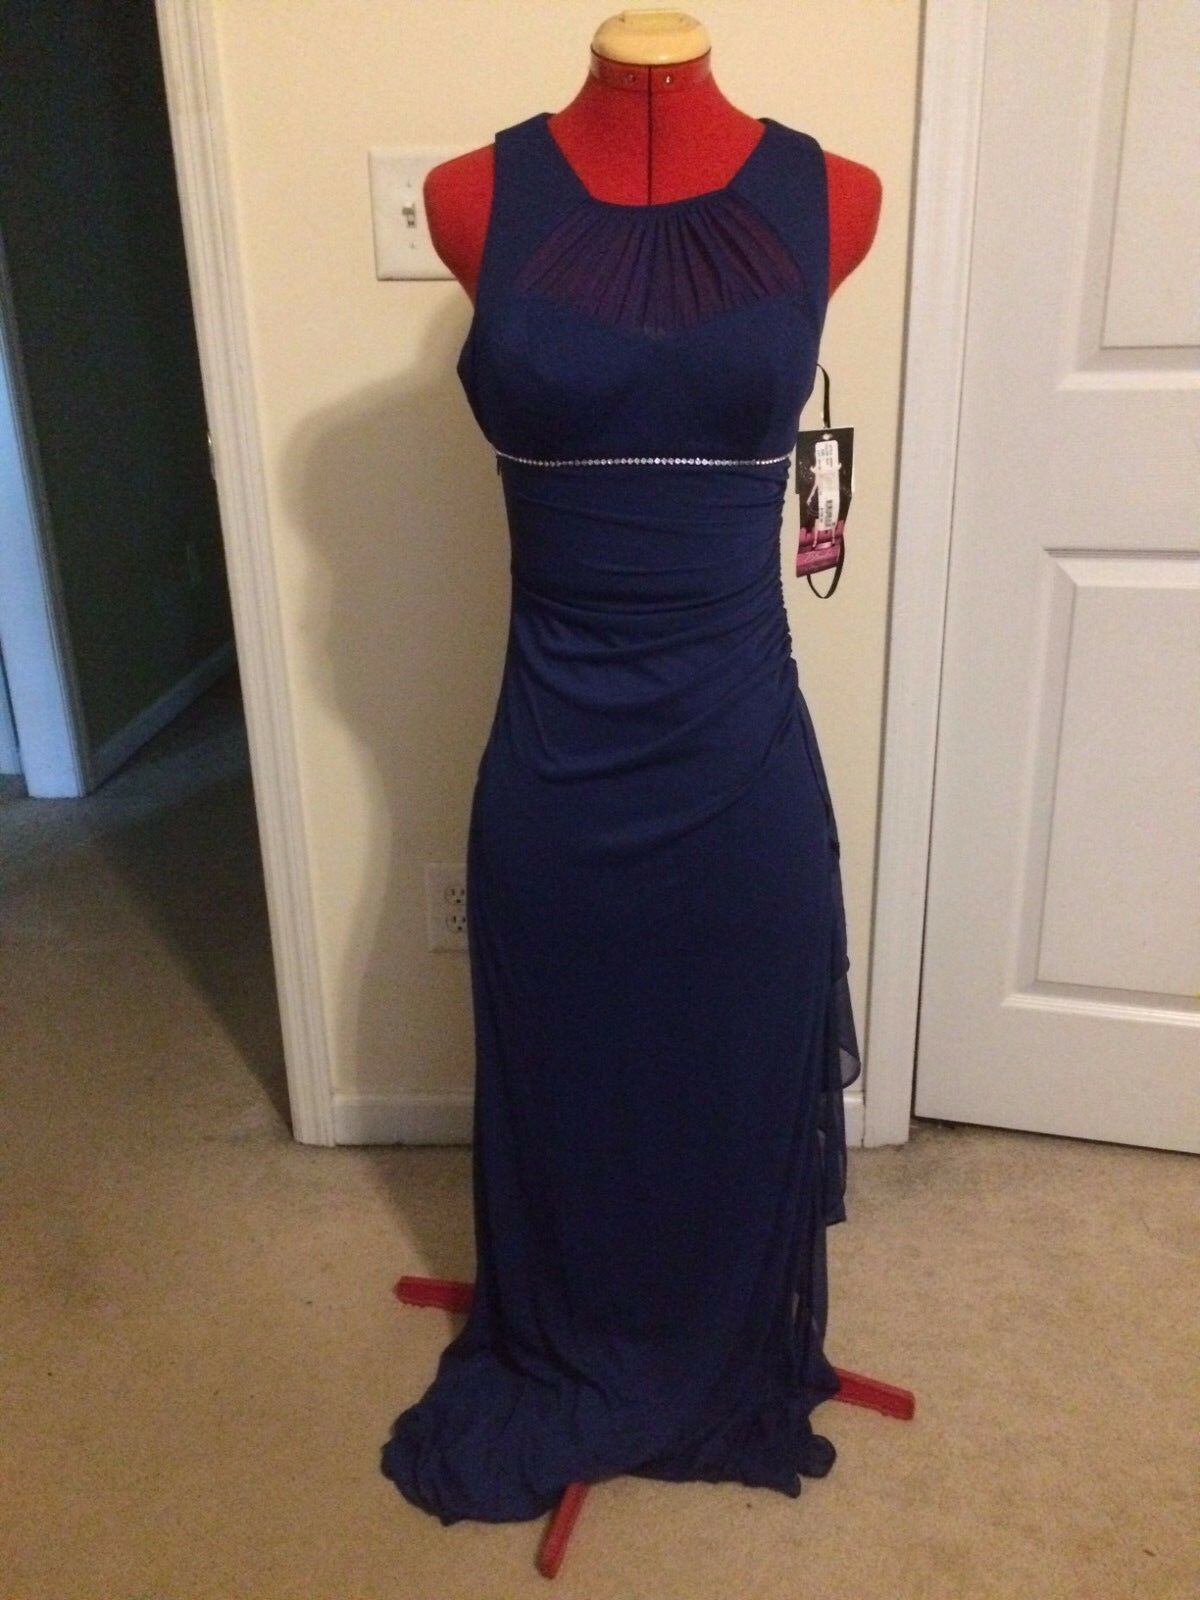 Blondie Nites Embellished Gown - bluee - Size 1 (Juniors) - NWT